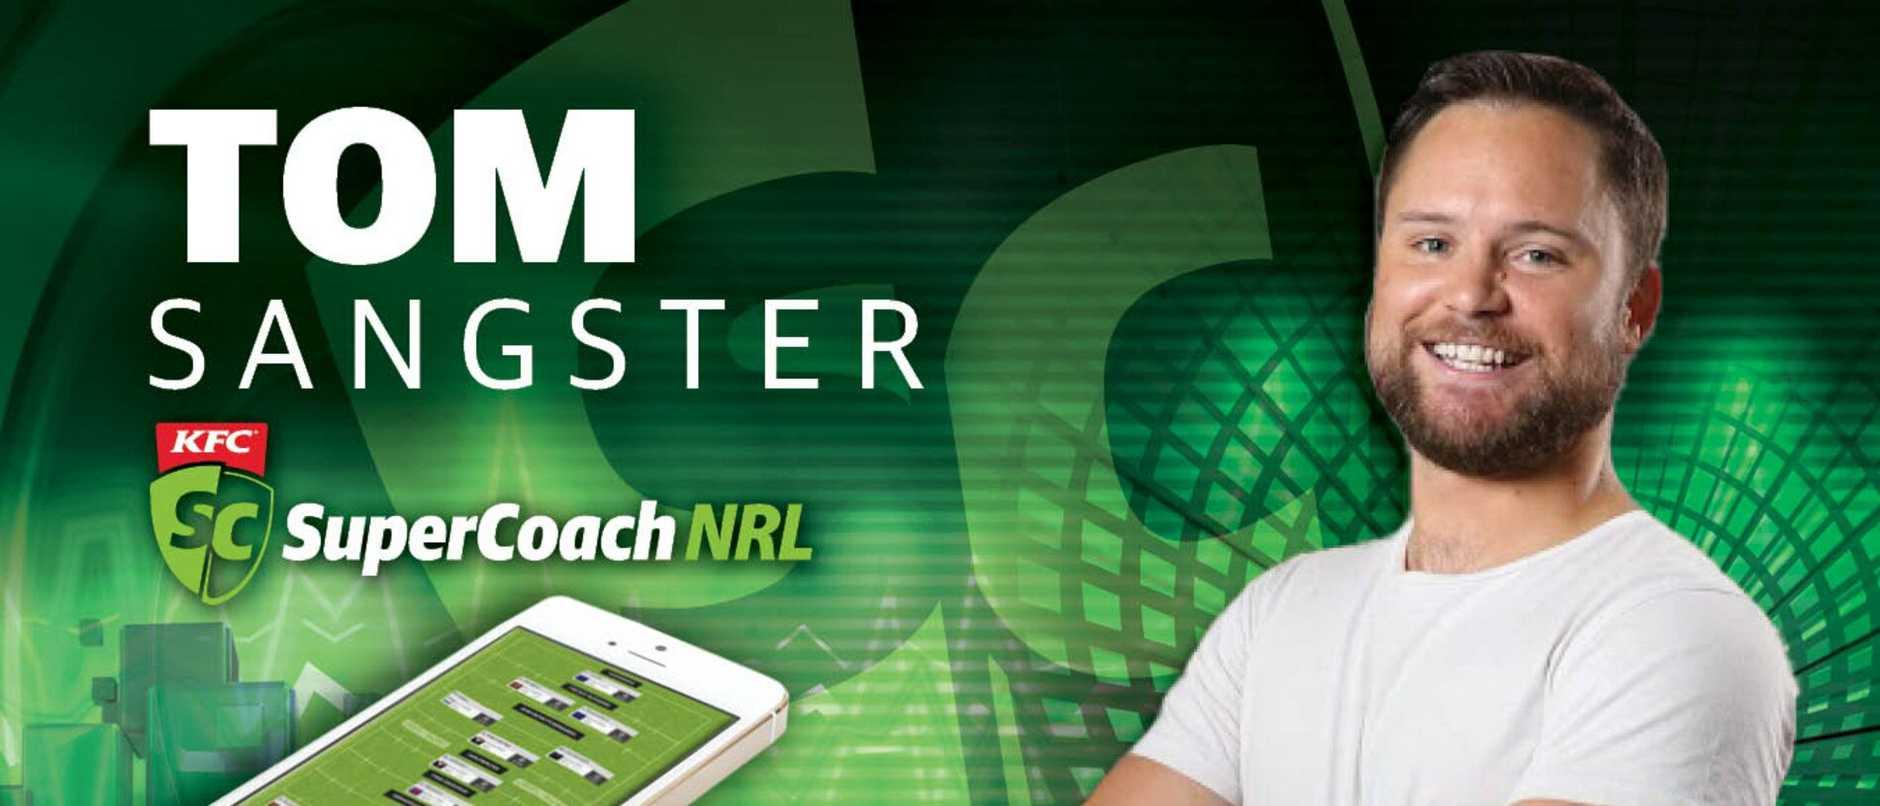 KFC SuperCoach NRL 2020: Tom Sangster's team revealed